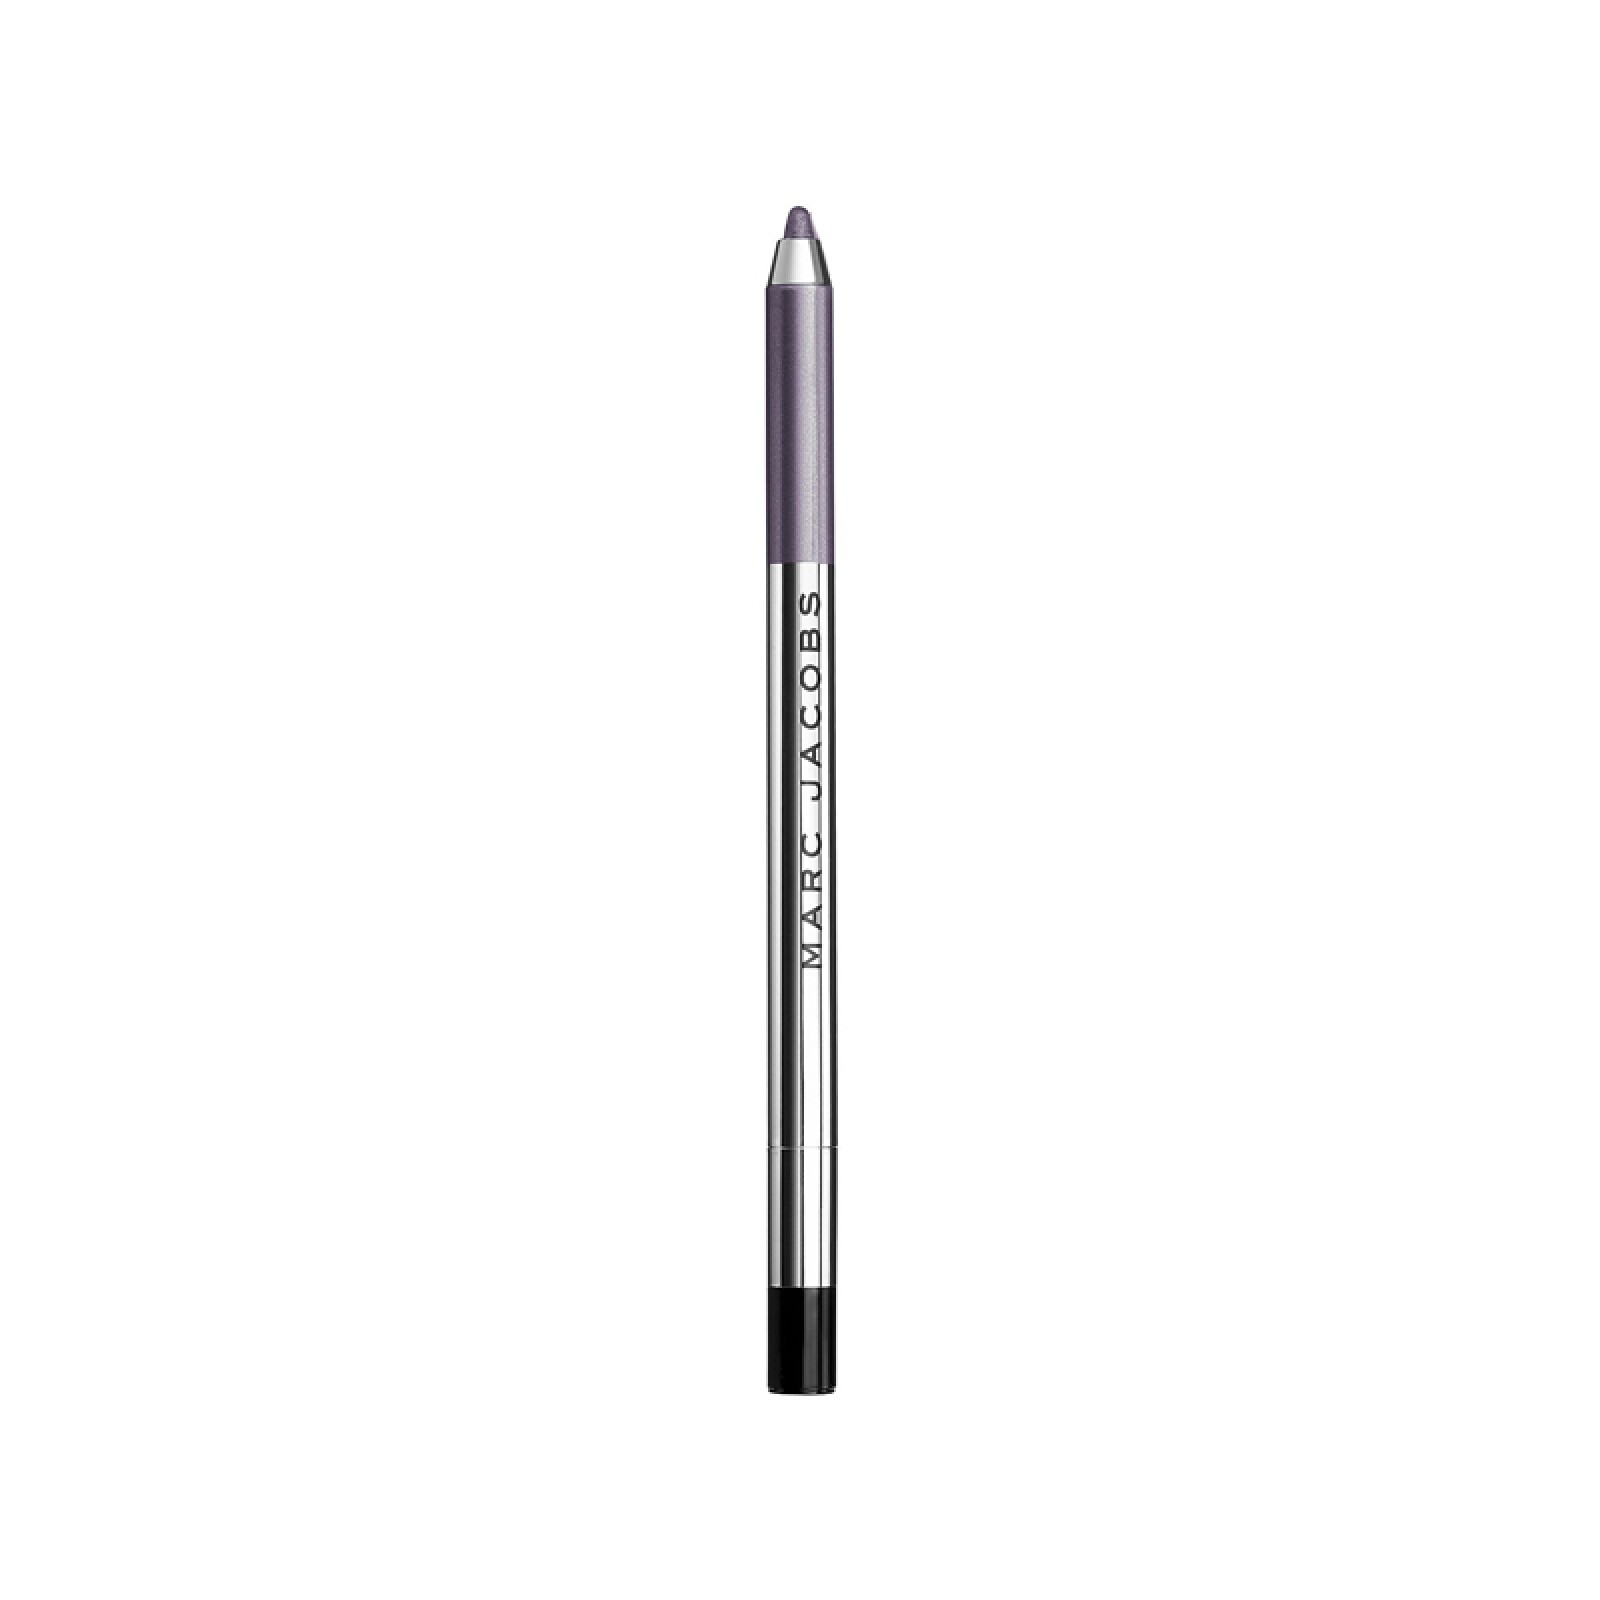 productos-maquillaje-skincare-belleza-beauty-rutina-marc